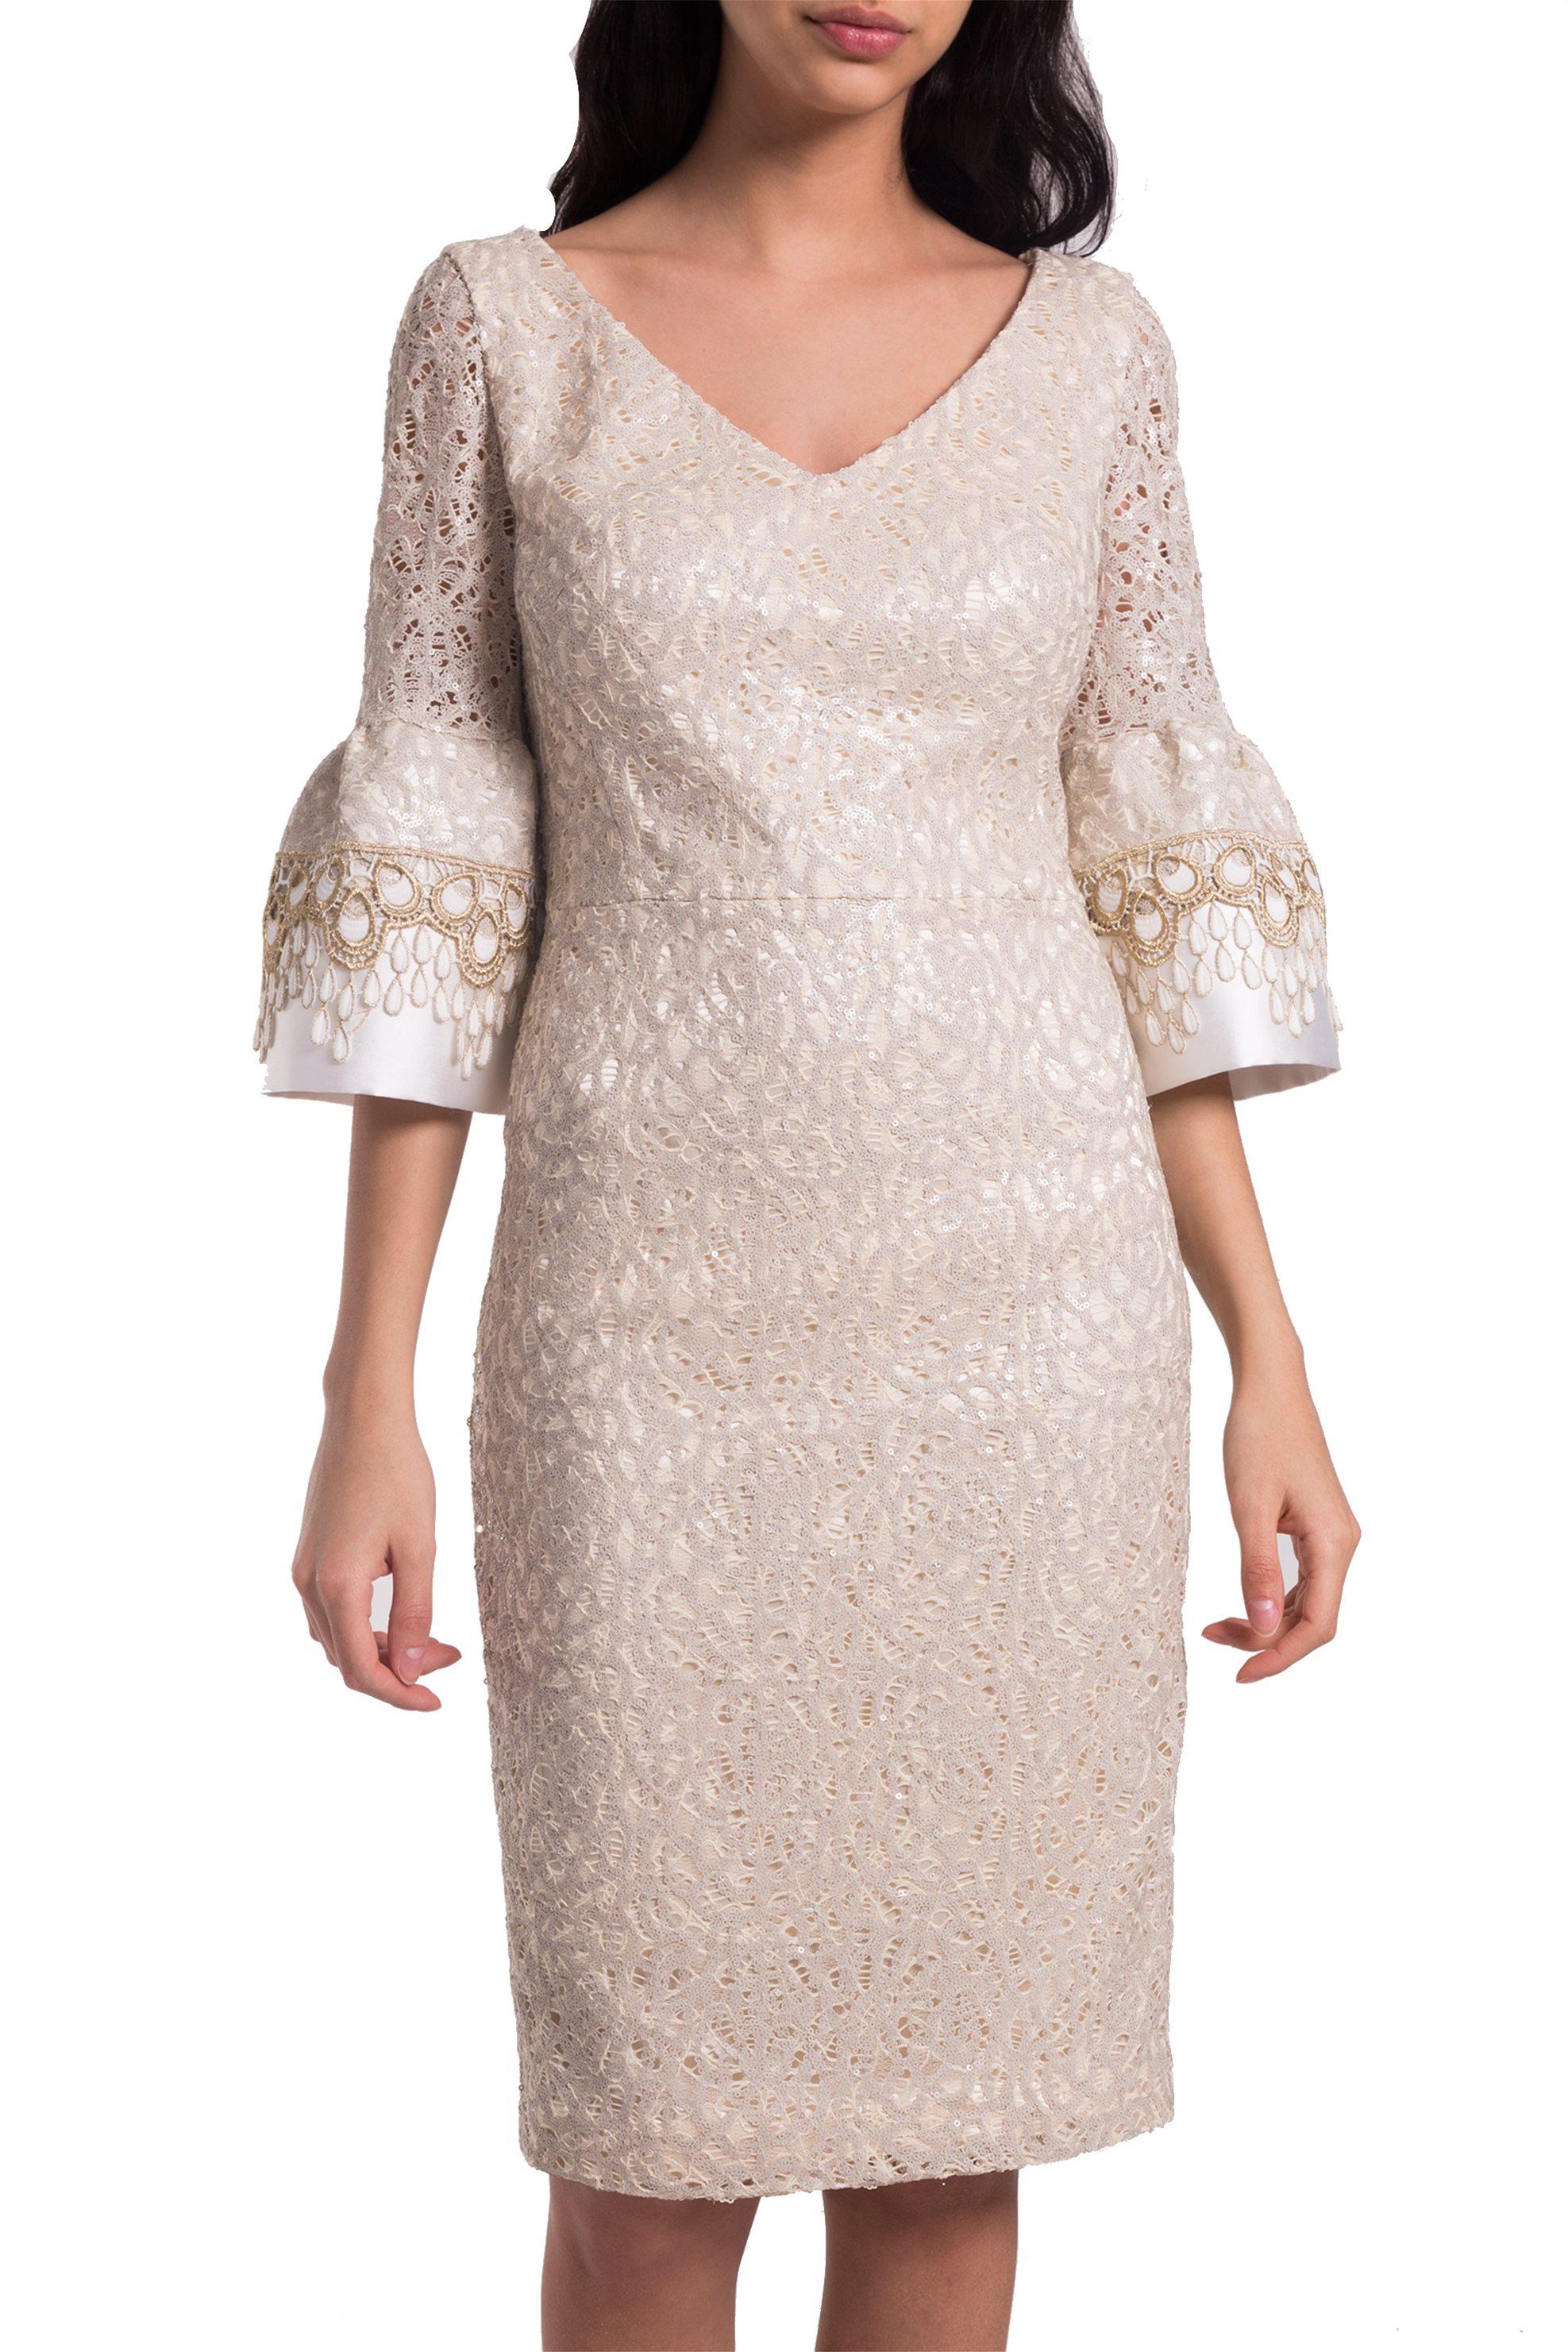 dbd9f0a34e1b Γυναικείο φόρεμα σε ίσια γραμμή με δαντελένια μανίκια Jupe - 21.181.J05.009  - Μπεζ